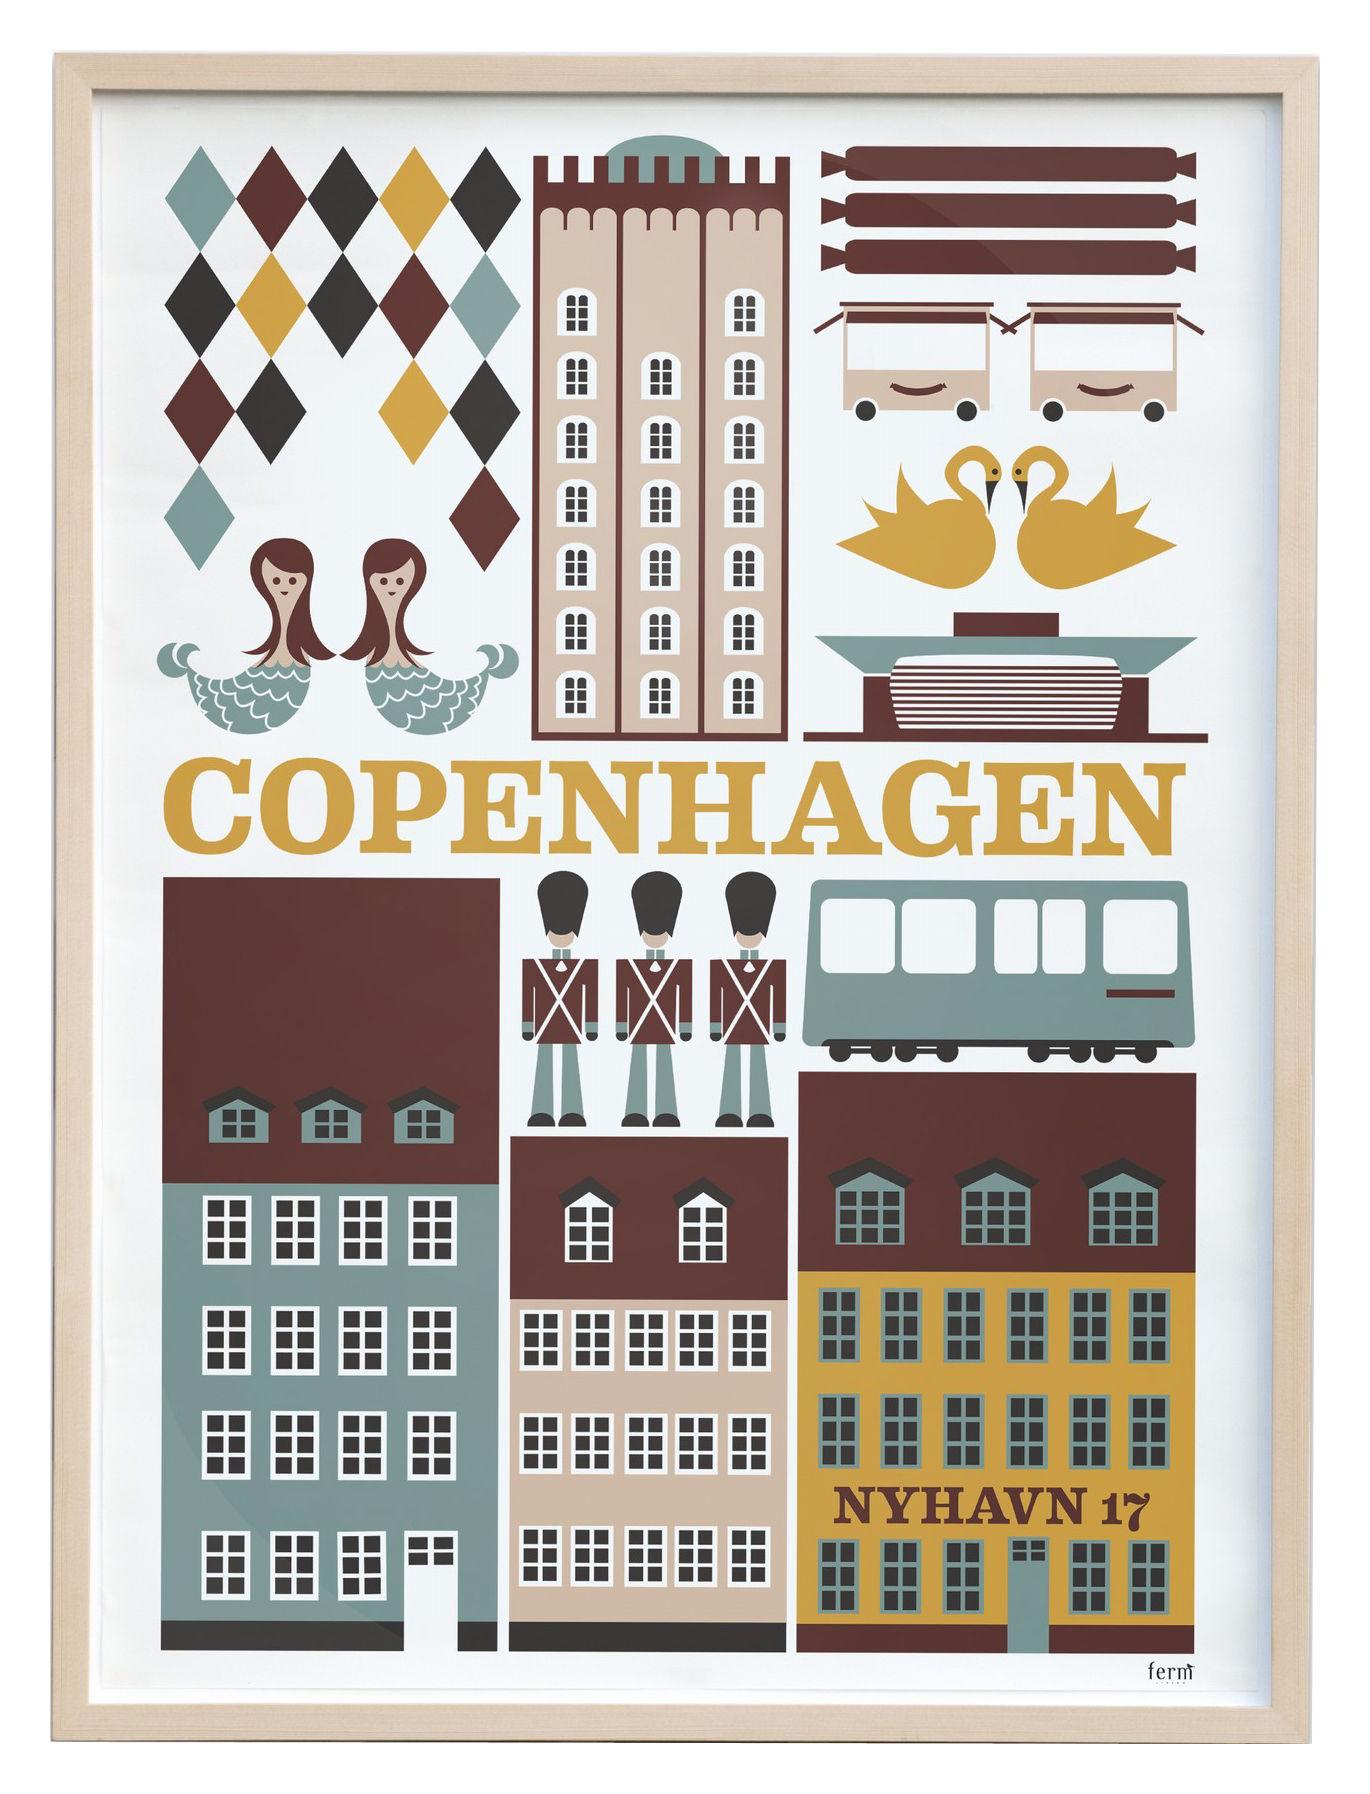 copenhagen poster 50 x 70 cm 50 x 70 cm multicoloured by ferm living. Black Bedroom Furniture Sets. Home Design Ideas